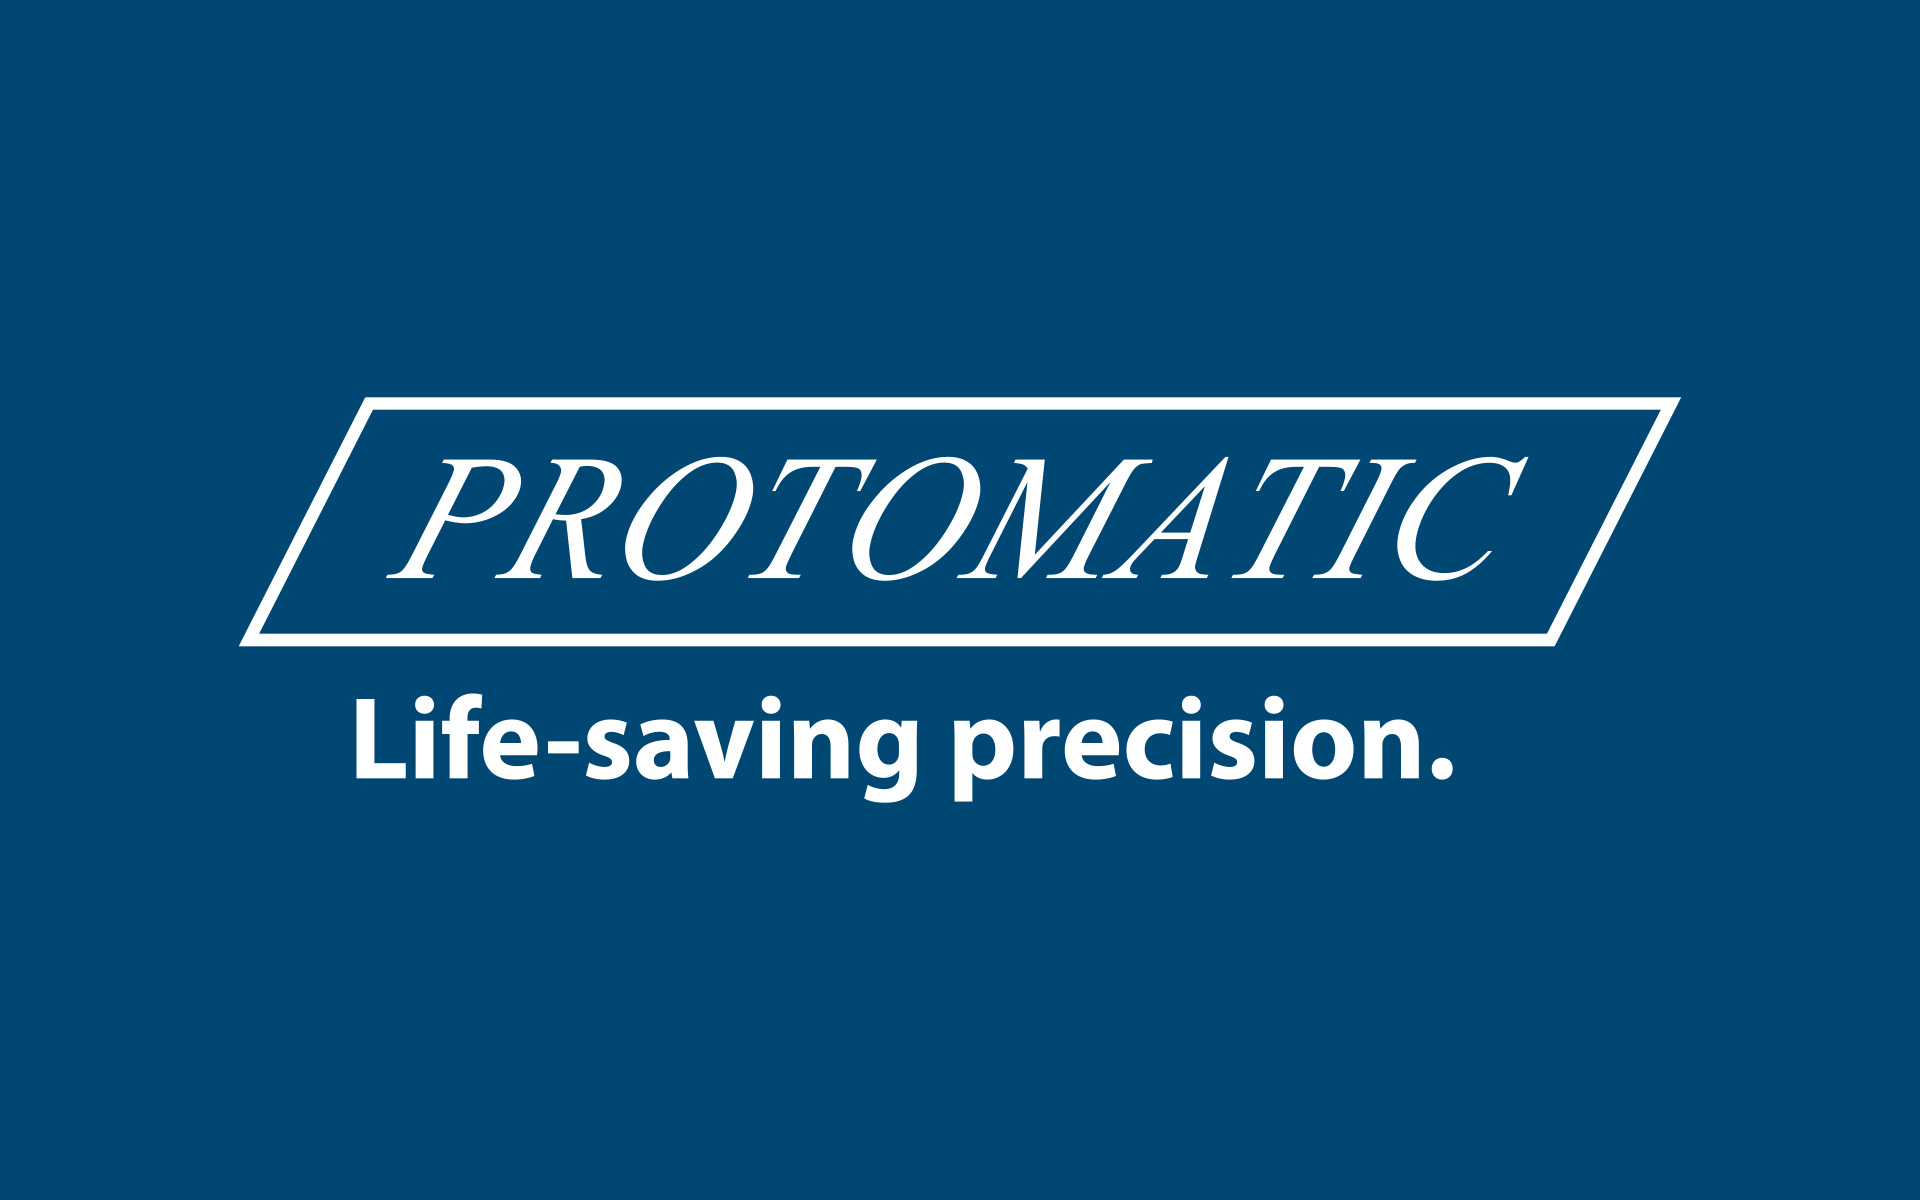 Branding - Protomatic, Inc.